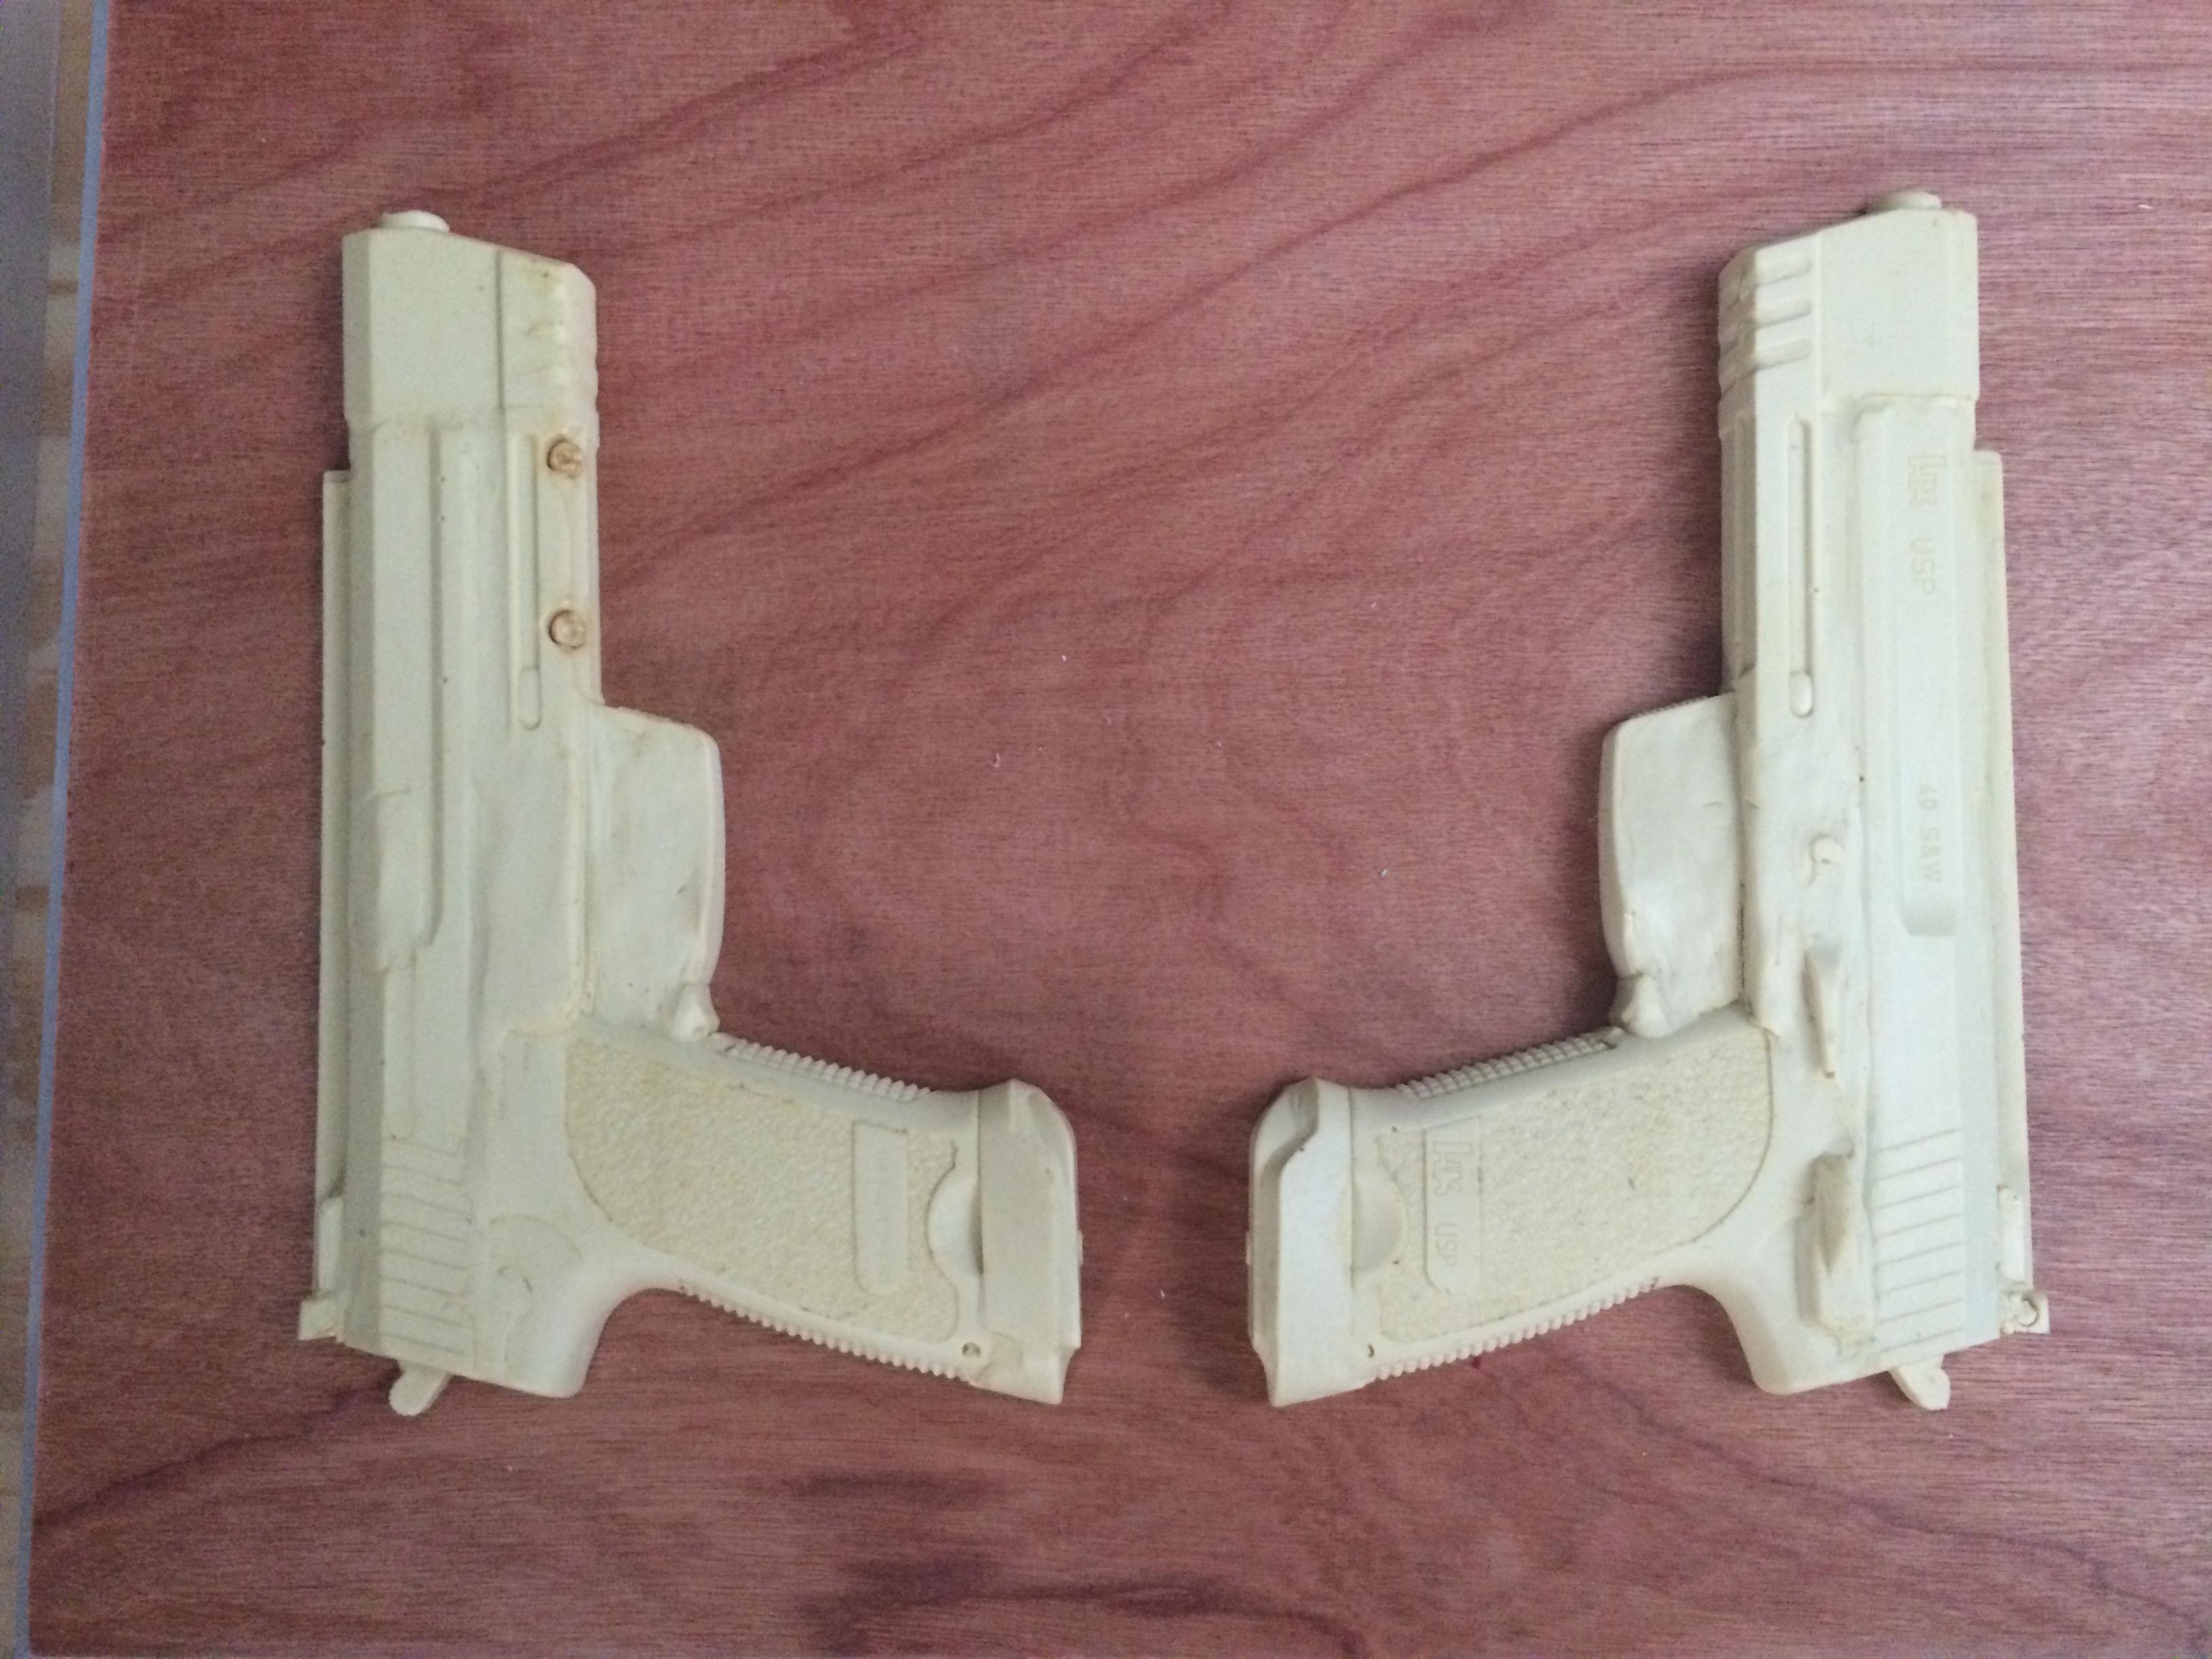 Vacuum Molding Kydex Ill Vacuum Form a Kydex